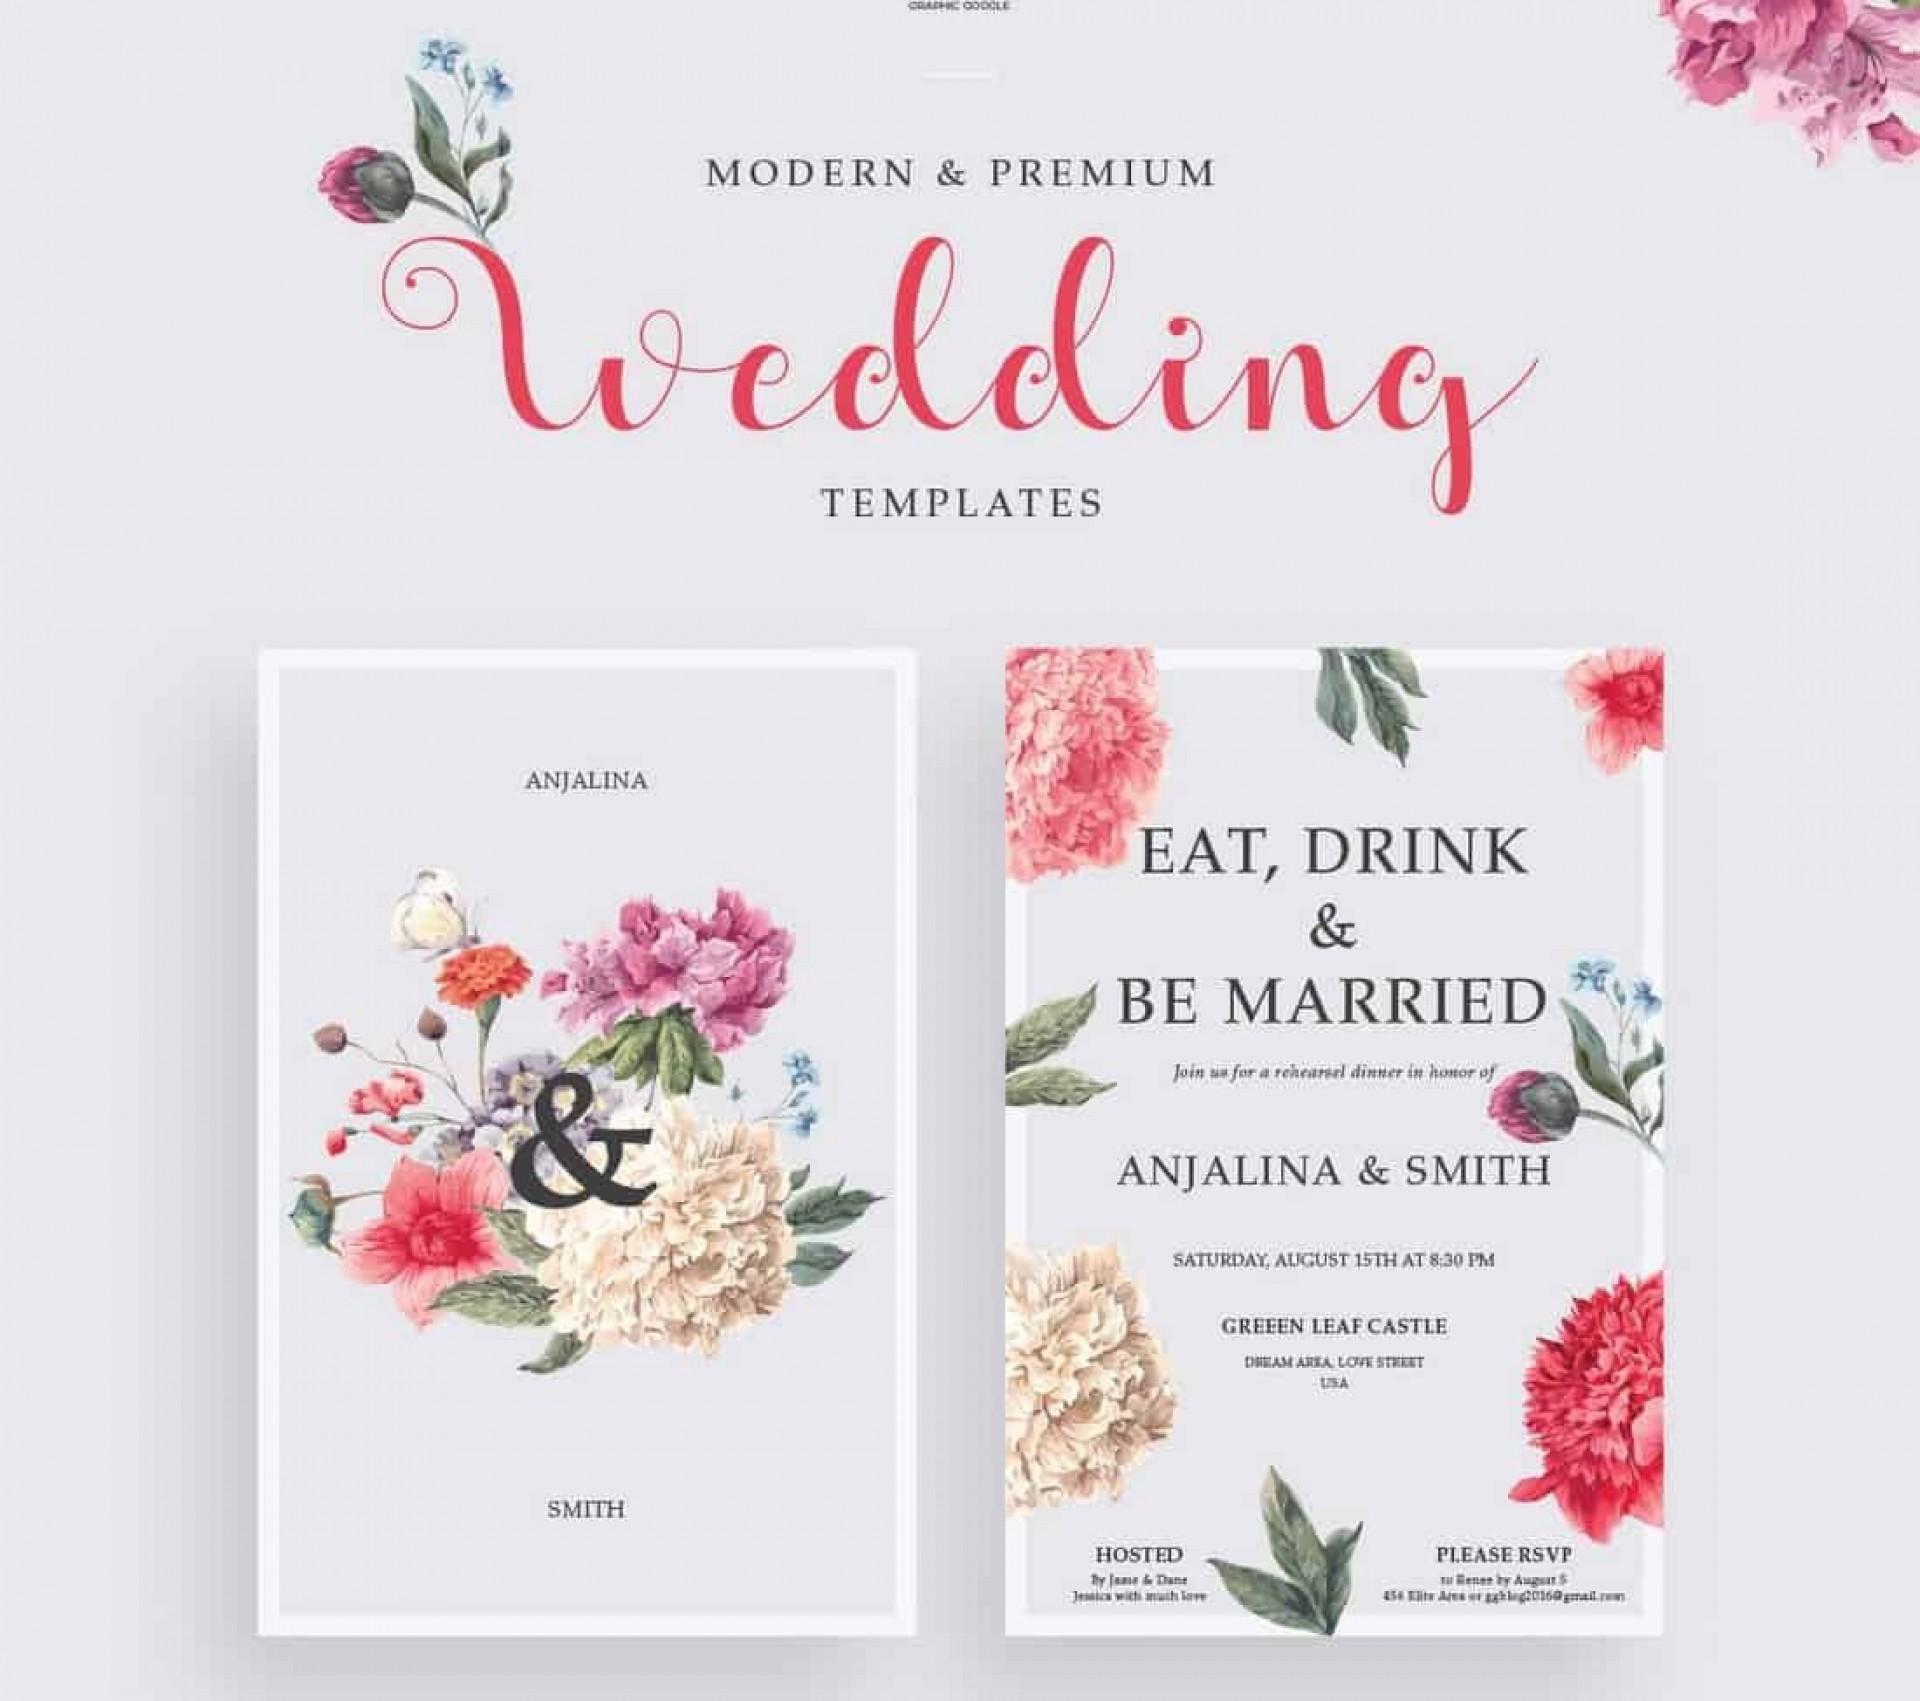 006 Sensational Free Wedding Invitation Template For Word 2019 Photo 1920